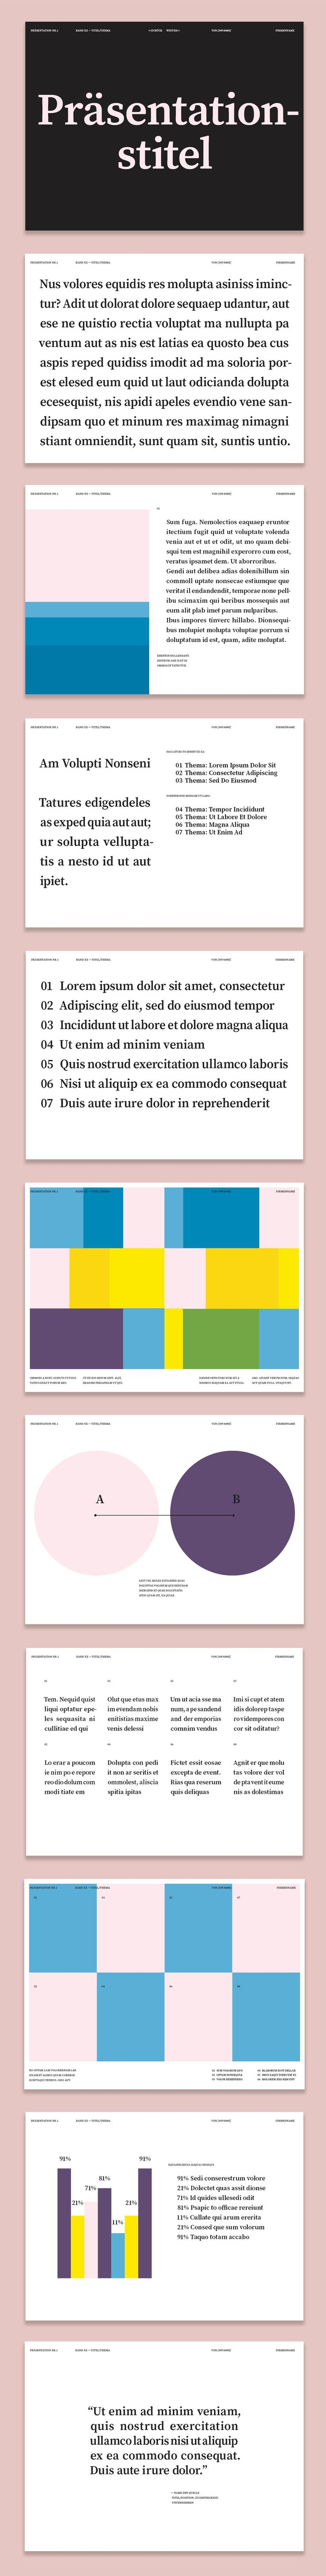 11 Best Design Inspiration Images On Pinterest Magazine Layouts Original Schematic Done By Tony Van Roon Thanks Alot Fotos Bilder Stockmedien Von Royal Studio Adobe Stock